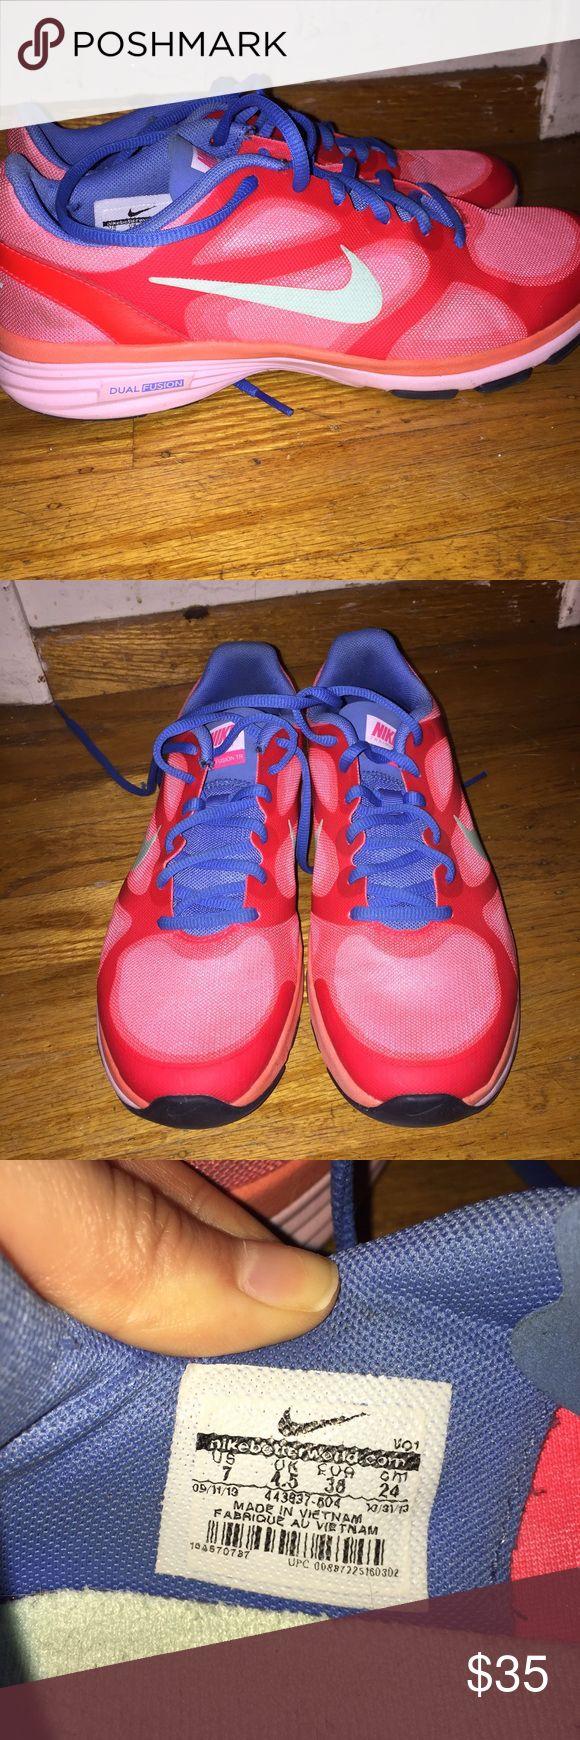 Pair of Nike Dual Fusion Sneakers Pair of Nike dual fusion sneakers. Very good condition. Only wore once indoors. Nike Shoes Sneakers